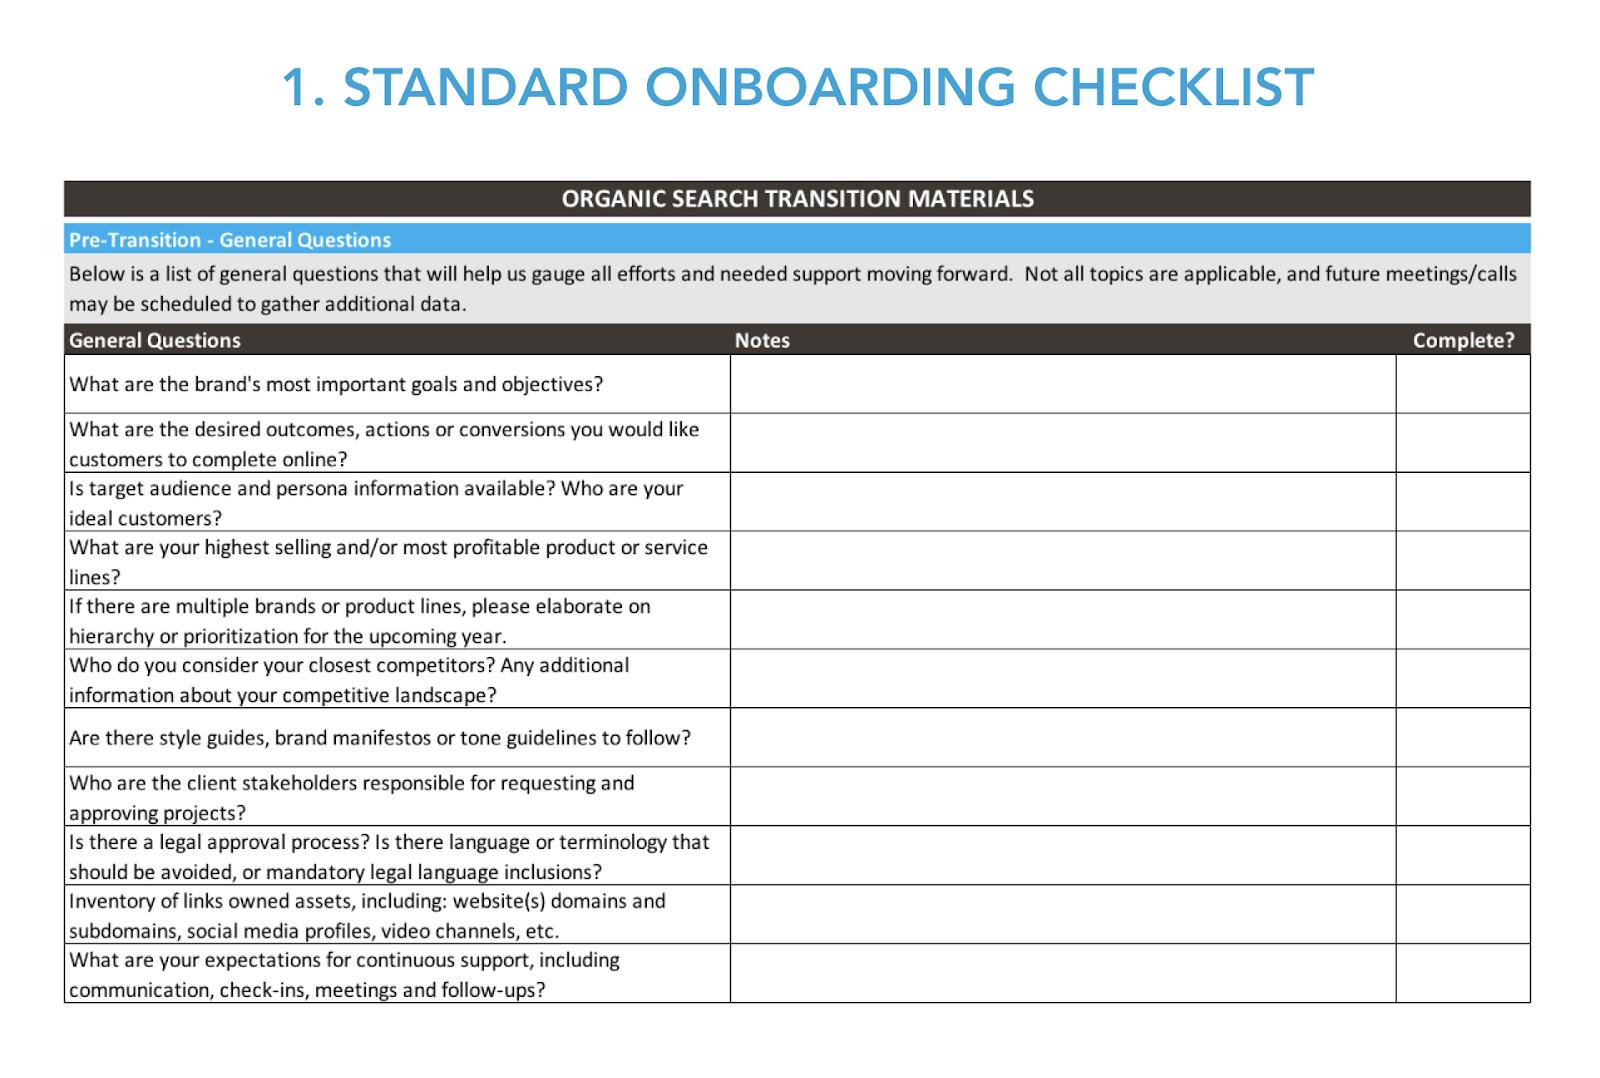 Standard onboarding checklist